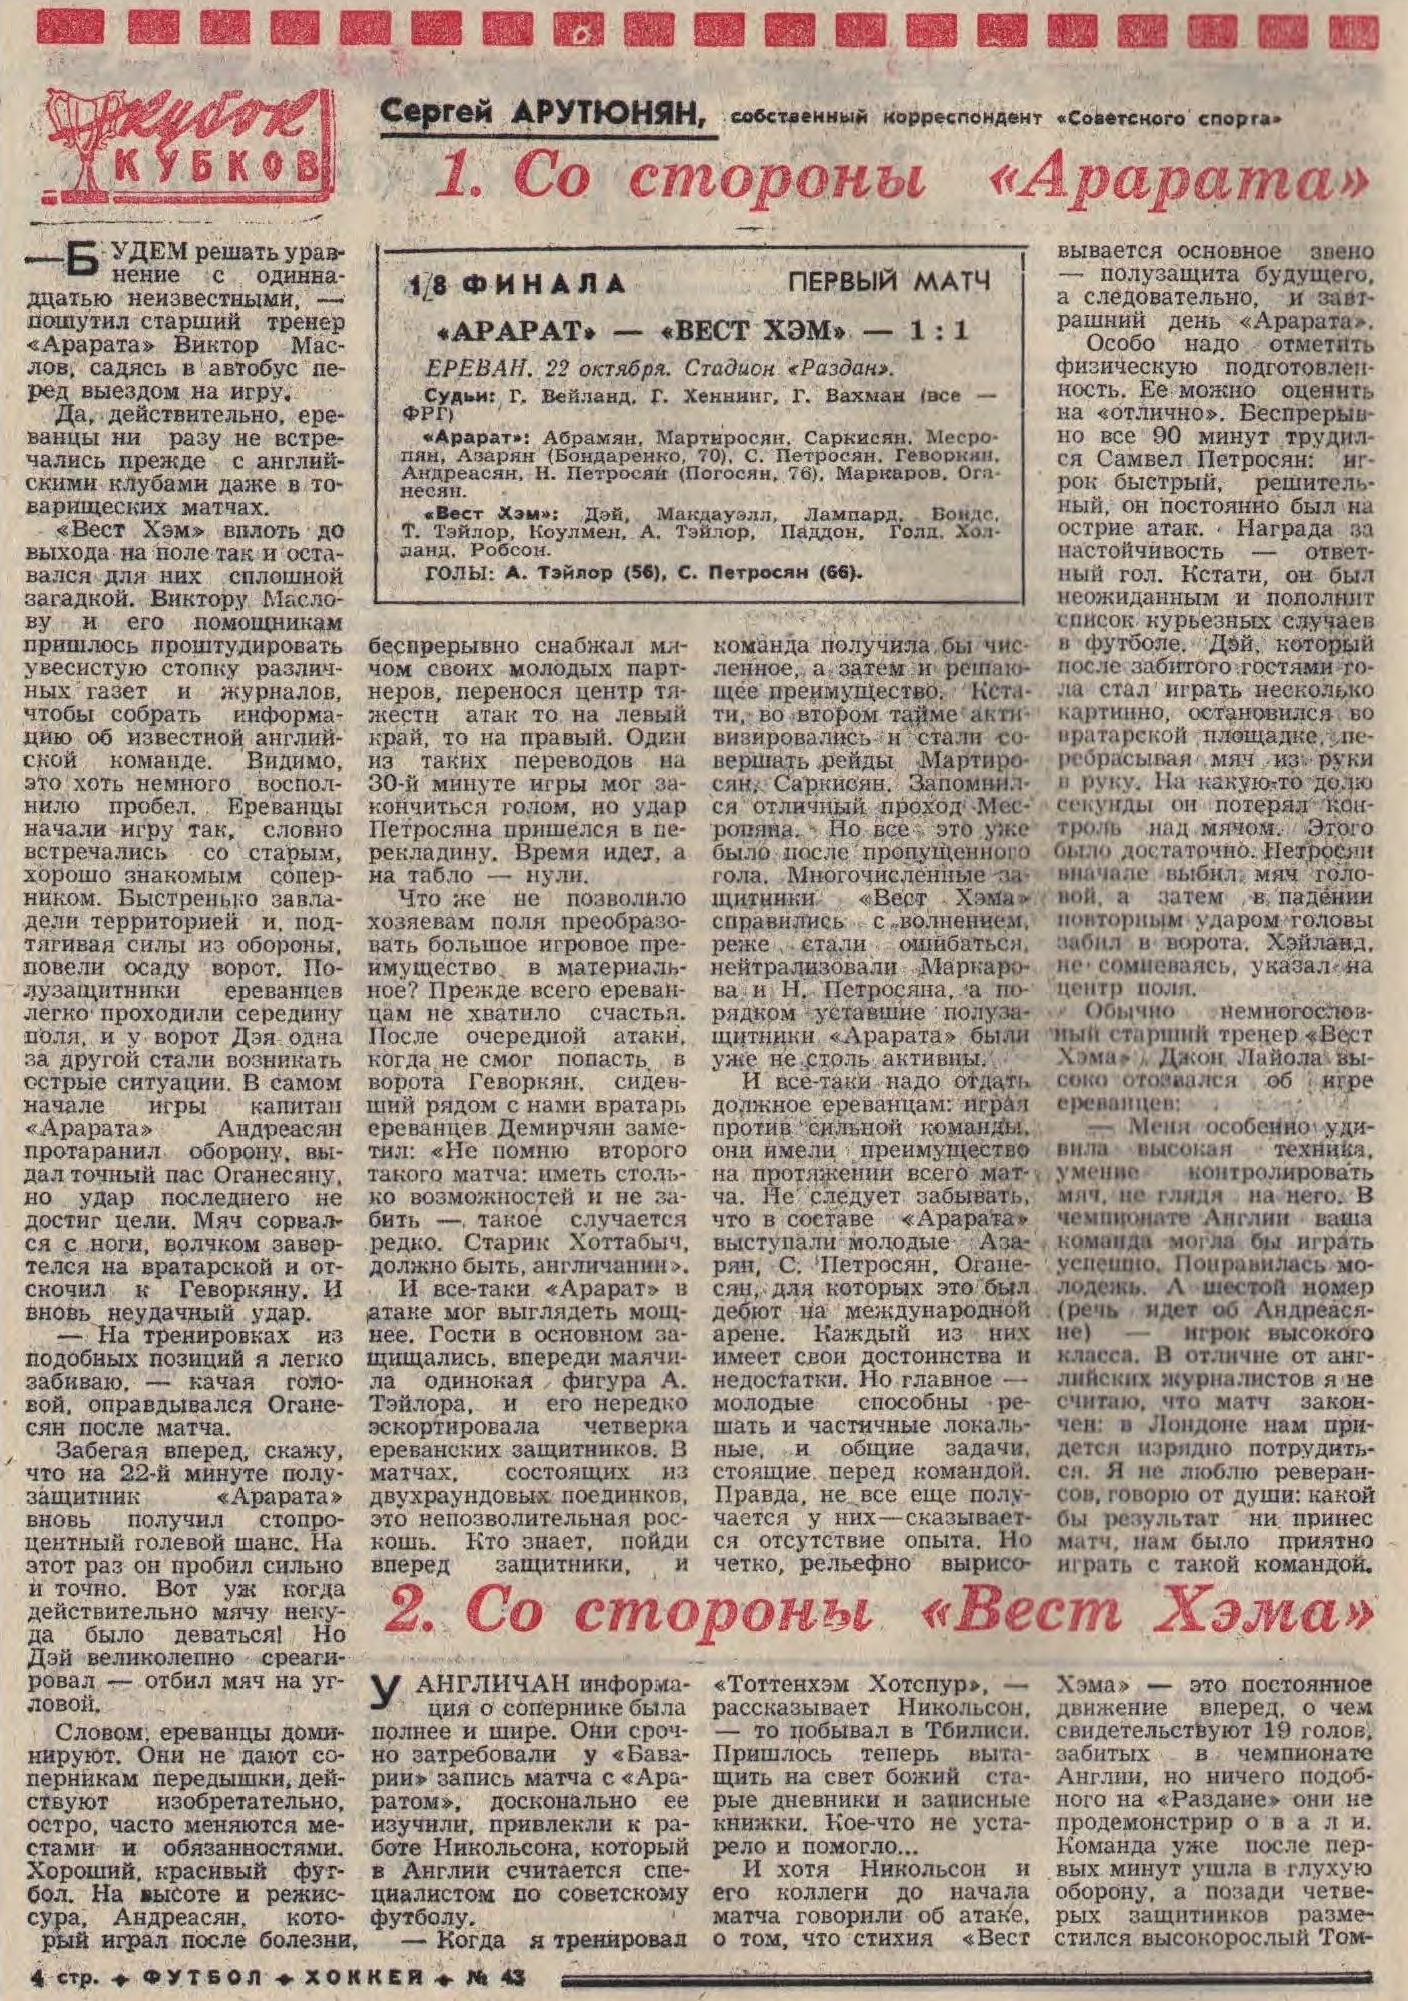 Арарат (СССР) - Вест Хэм (Англия) 1:1